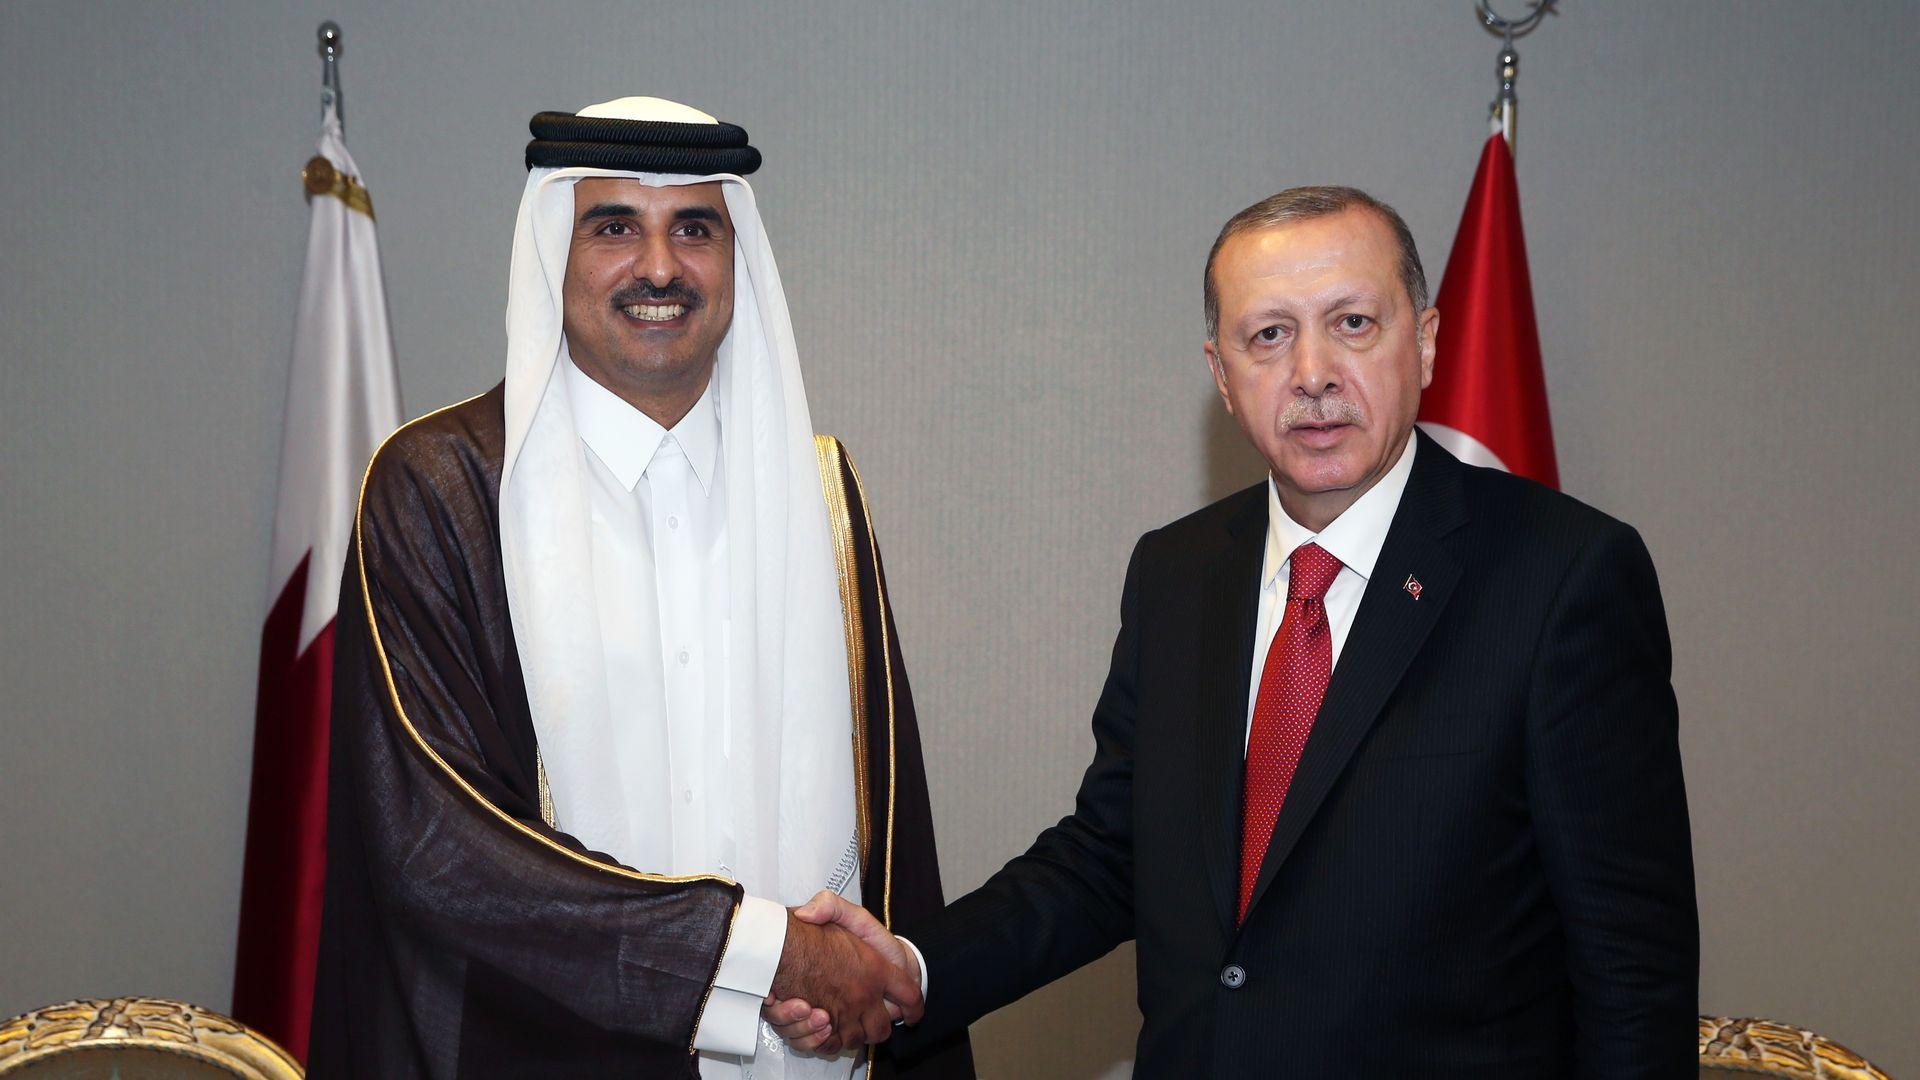 Qatar's emir and Turkey's president shaking hands